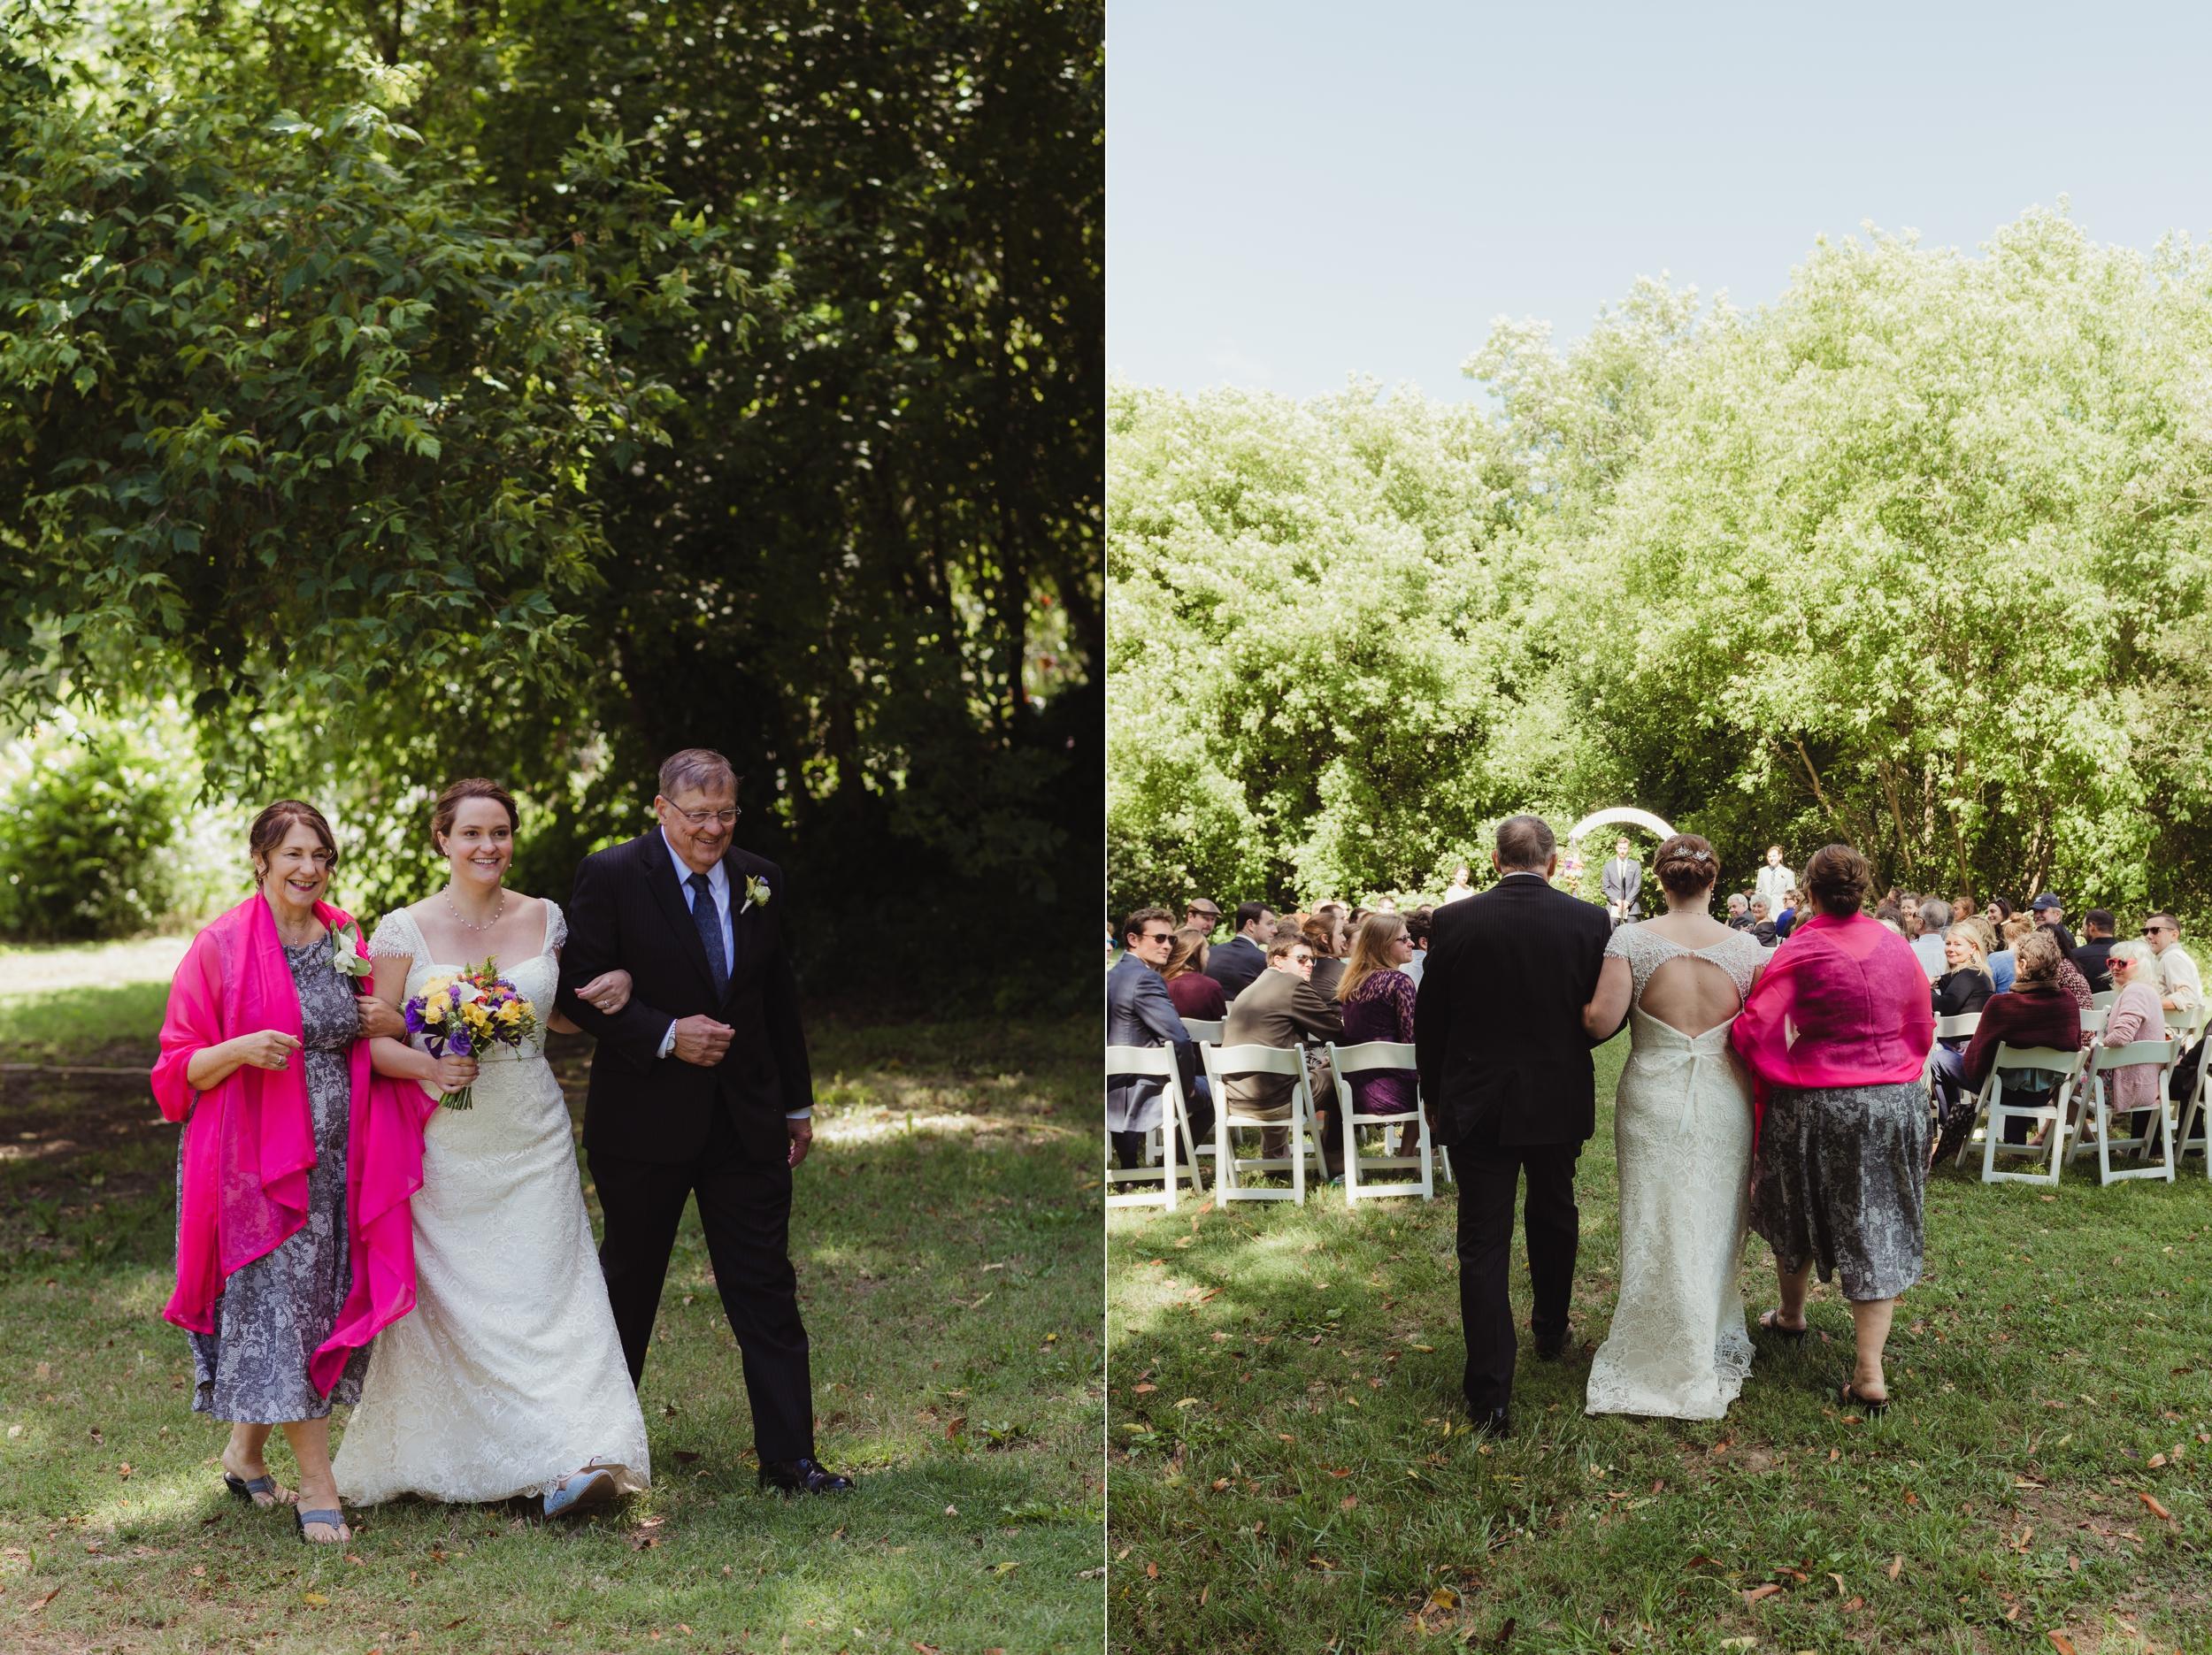 029-highland-dell-lodge-russian-river-wedding-vivianchen-148_WEB.jpg